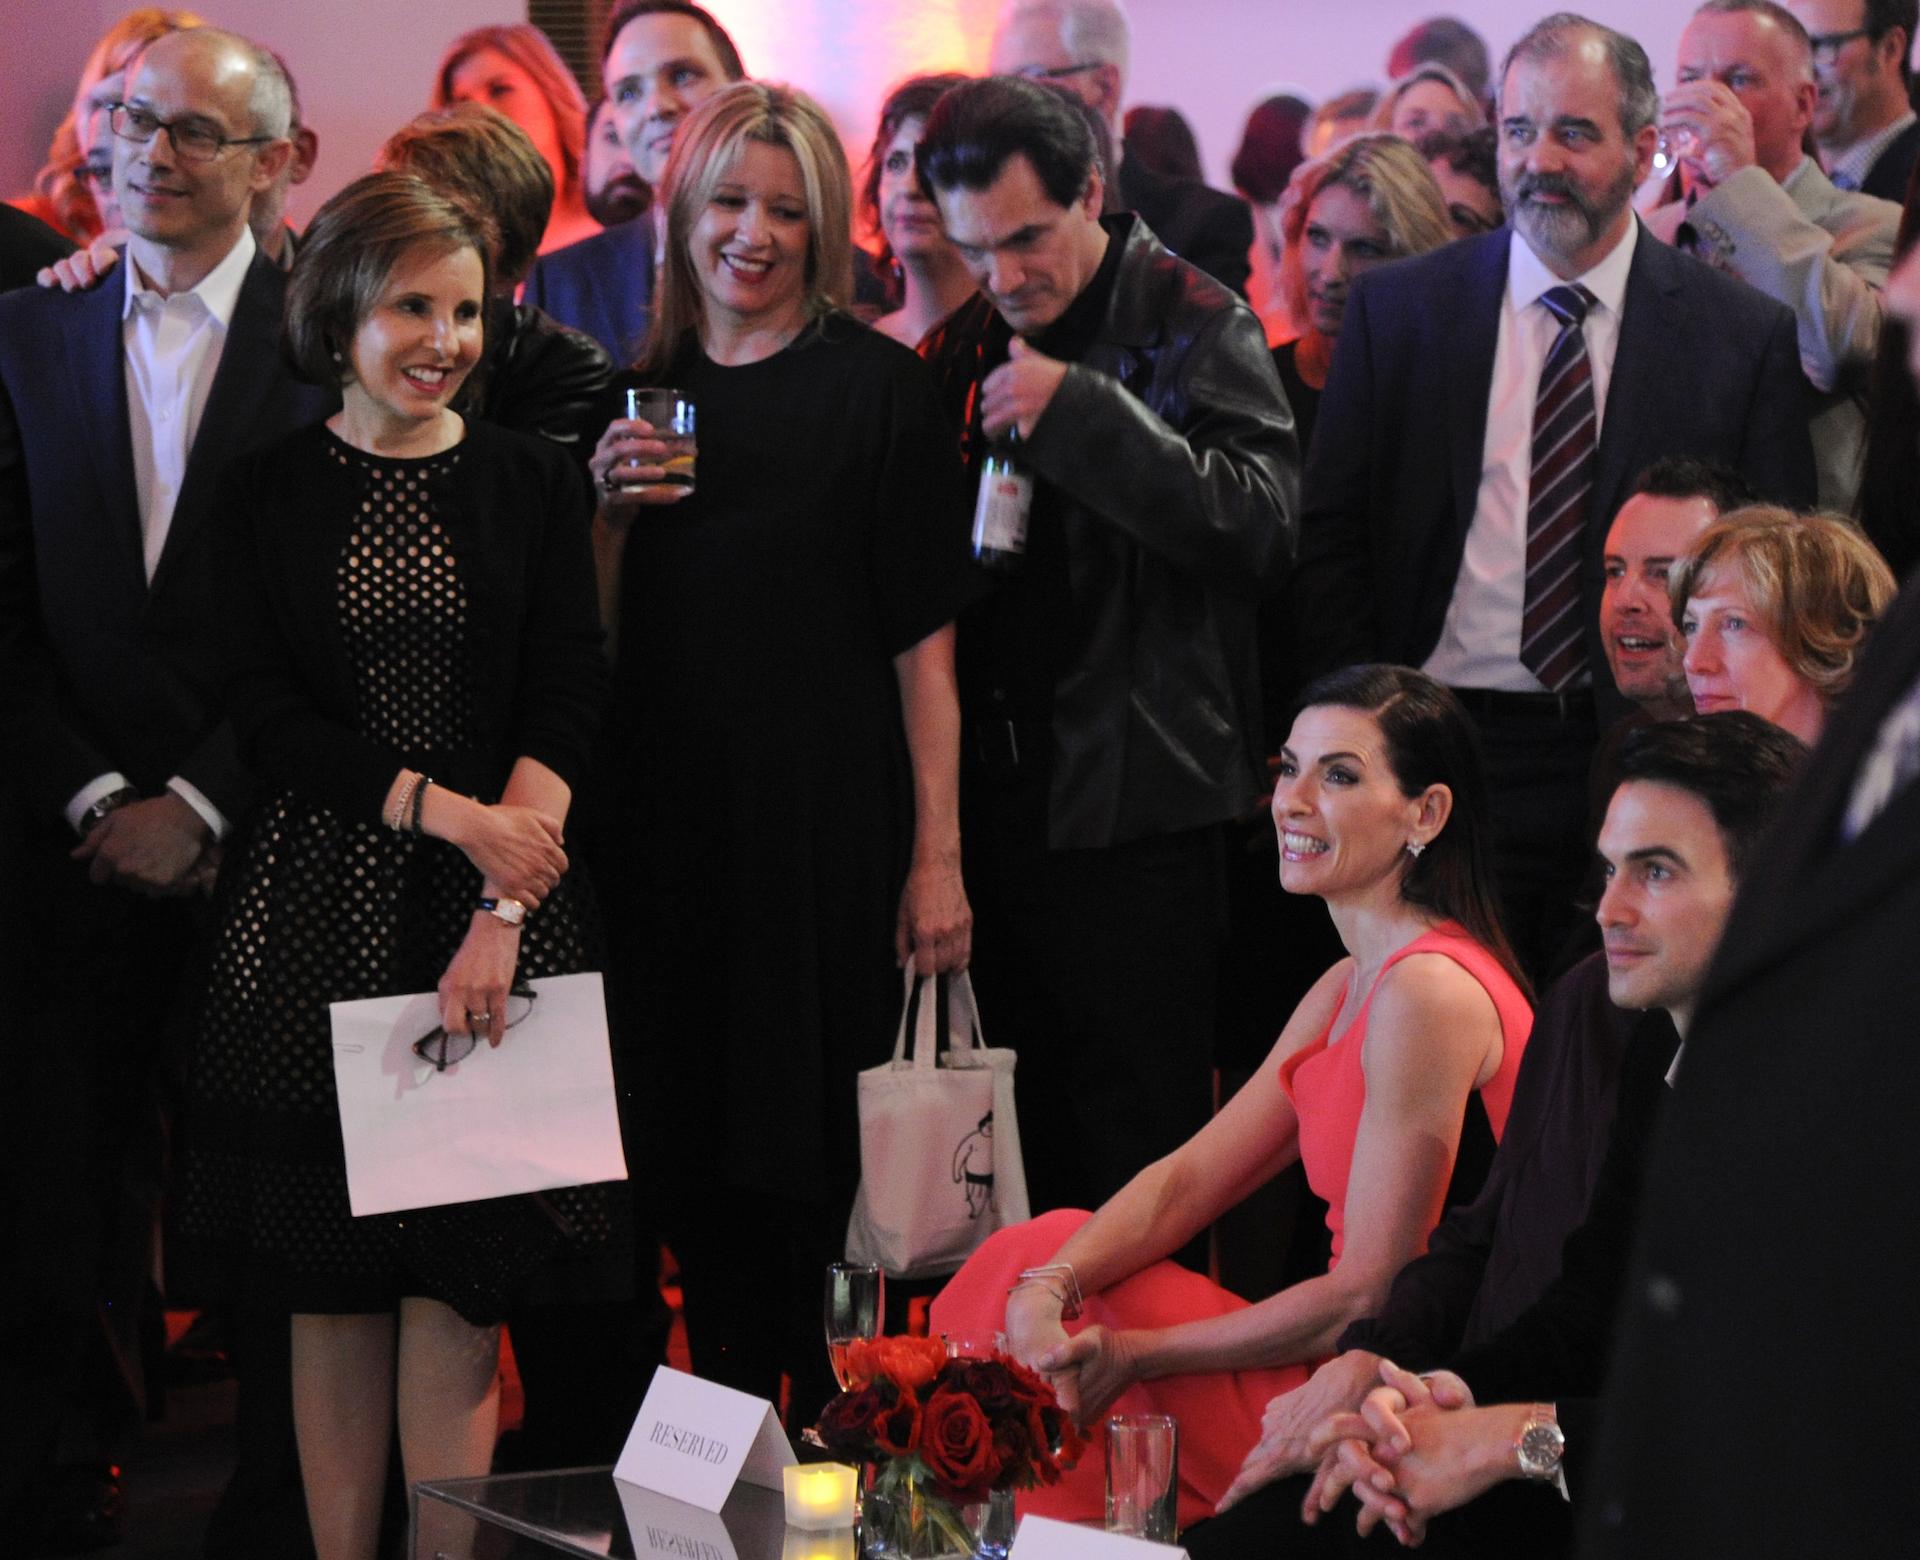 The cast and crew enjoy a touching speech